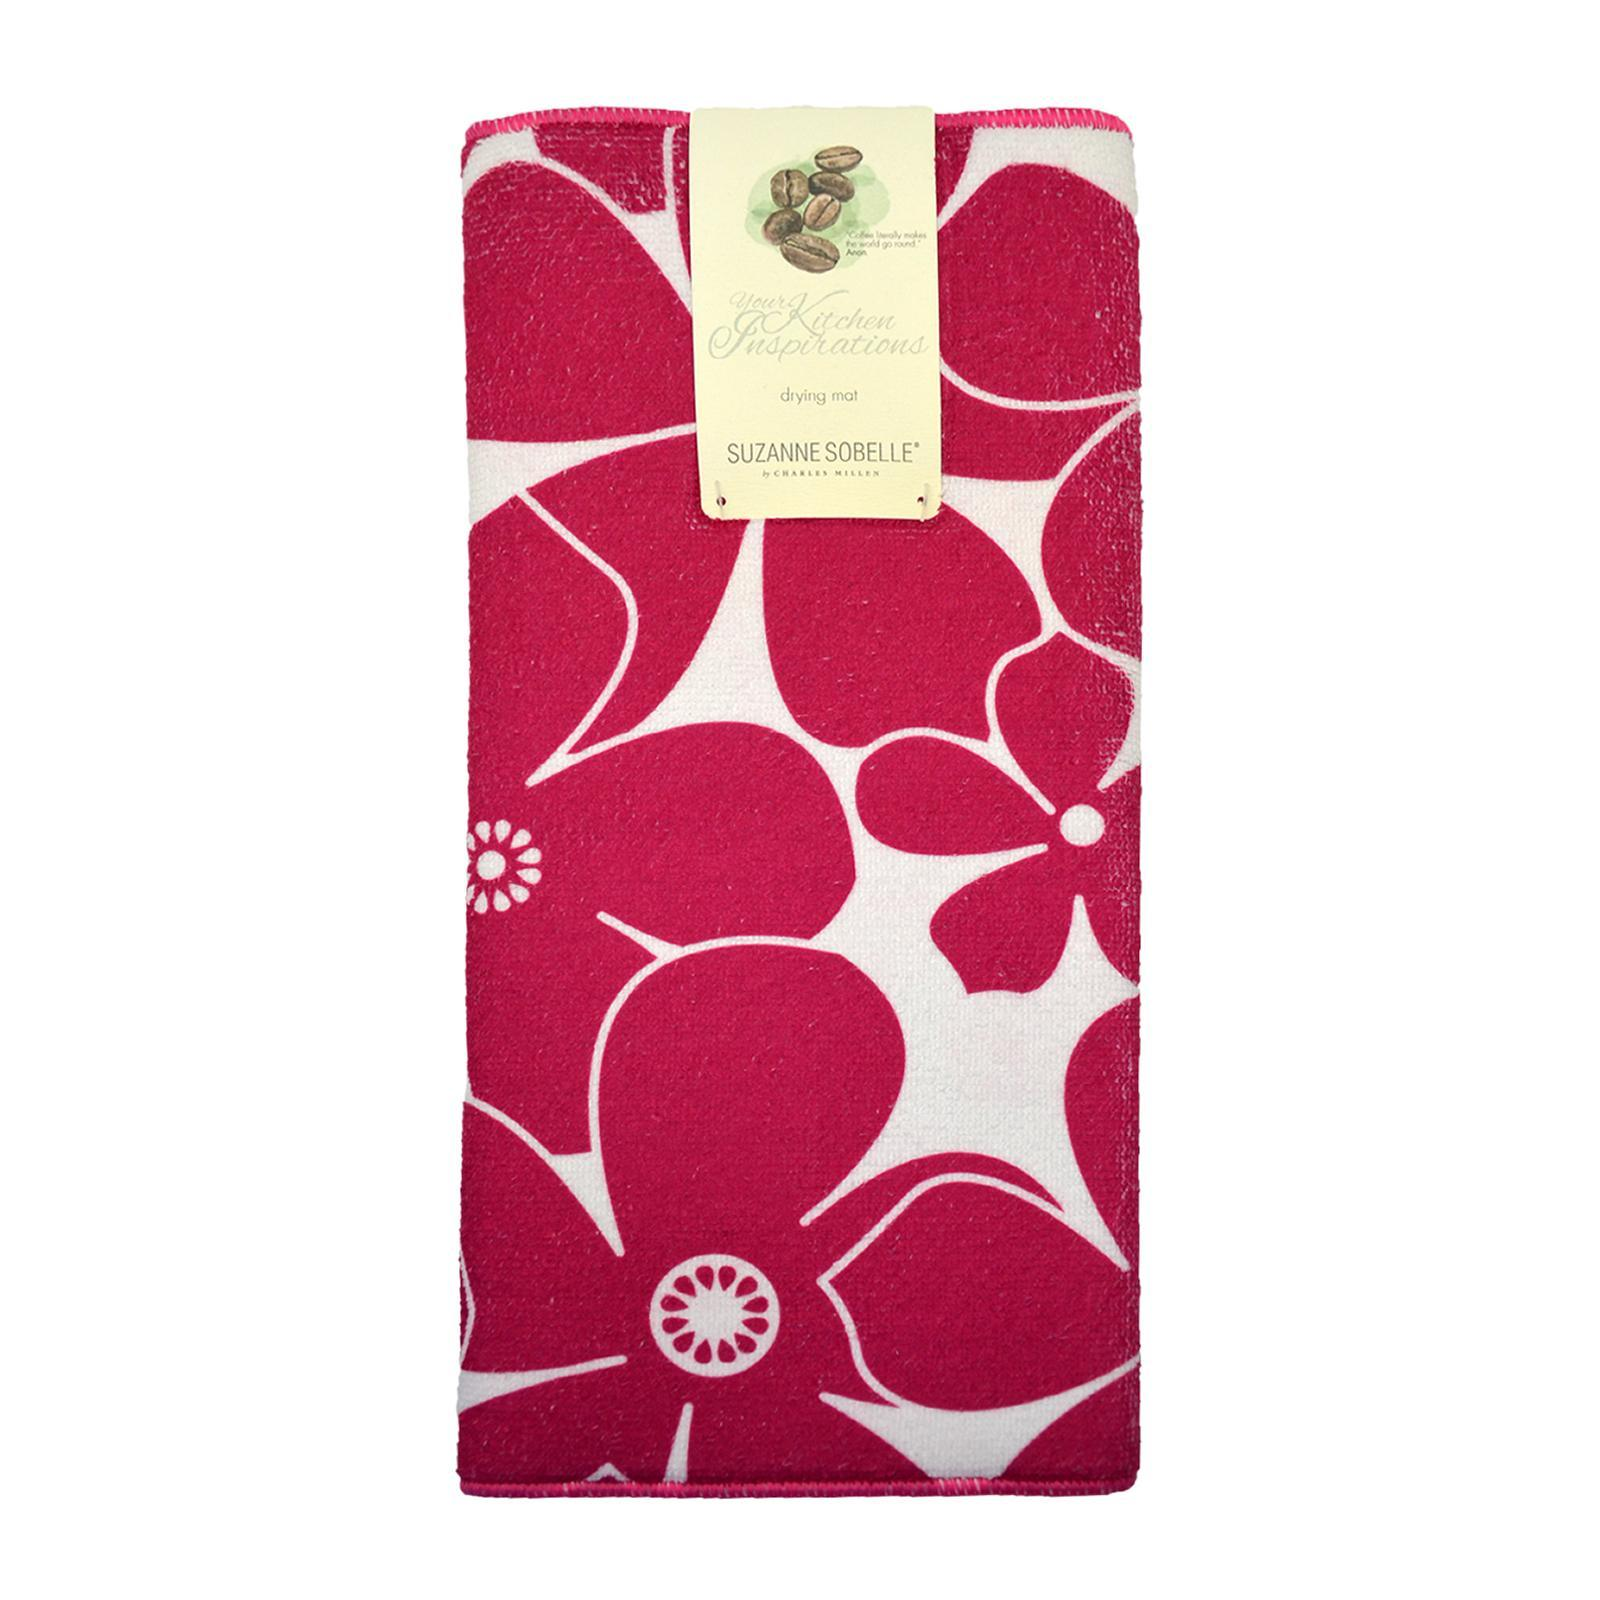 Suzanne Sobelle Microfiber Drying Mat 38x50cm Printed Flowers-Magenta Kitchen Coordinates